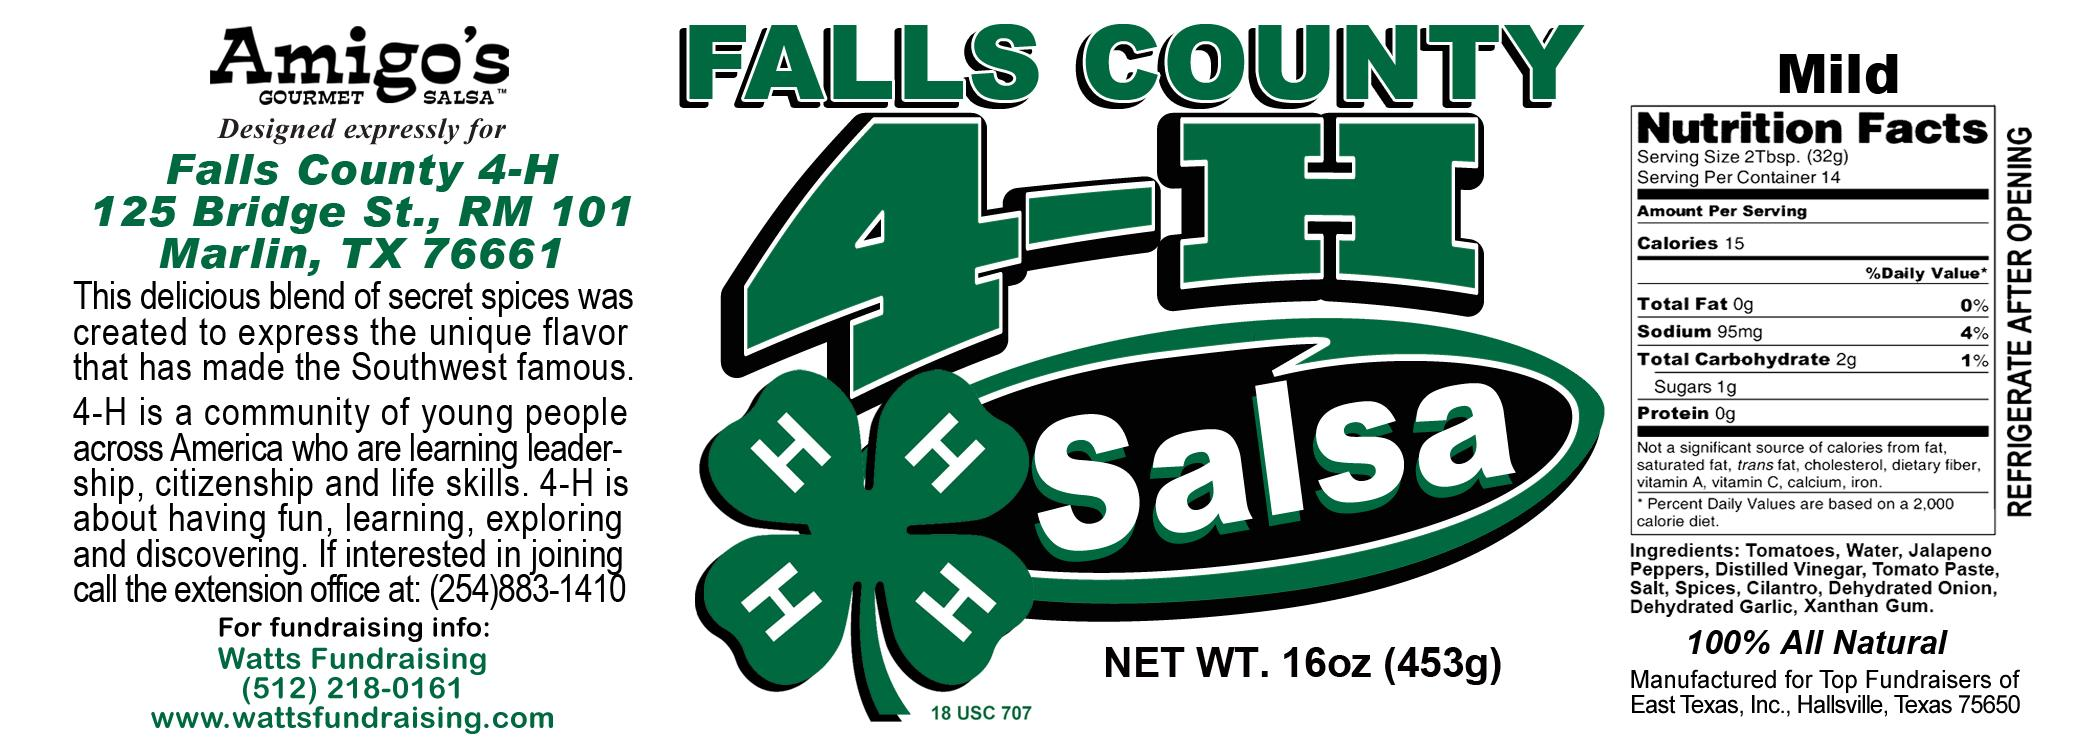 Falls County 4-H MILD.jpg